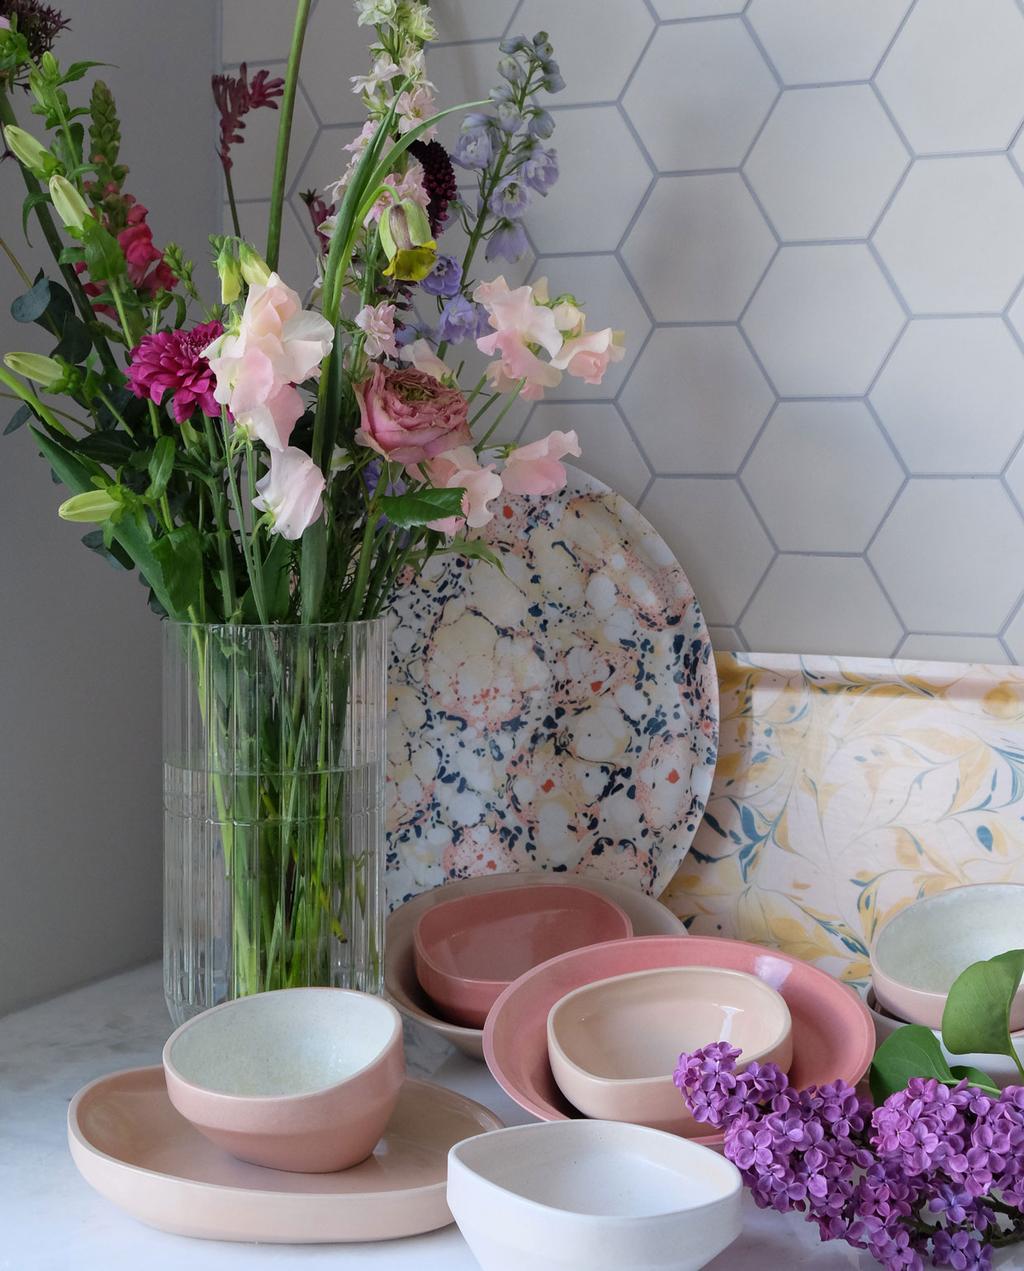 vtwonen PRCHTG | moederdagcadeau bloemen in vaas naast roze en wit servies